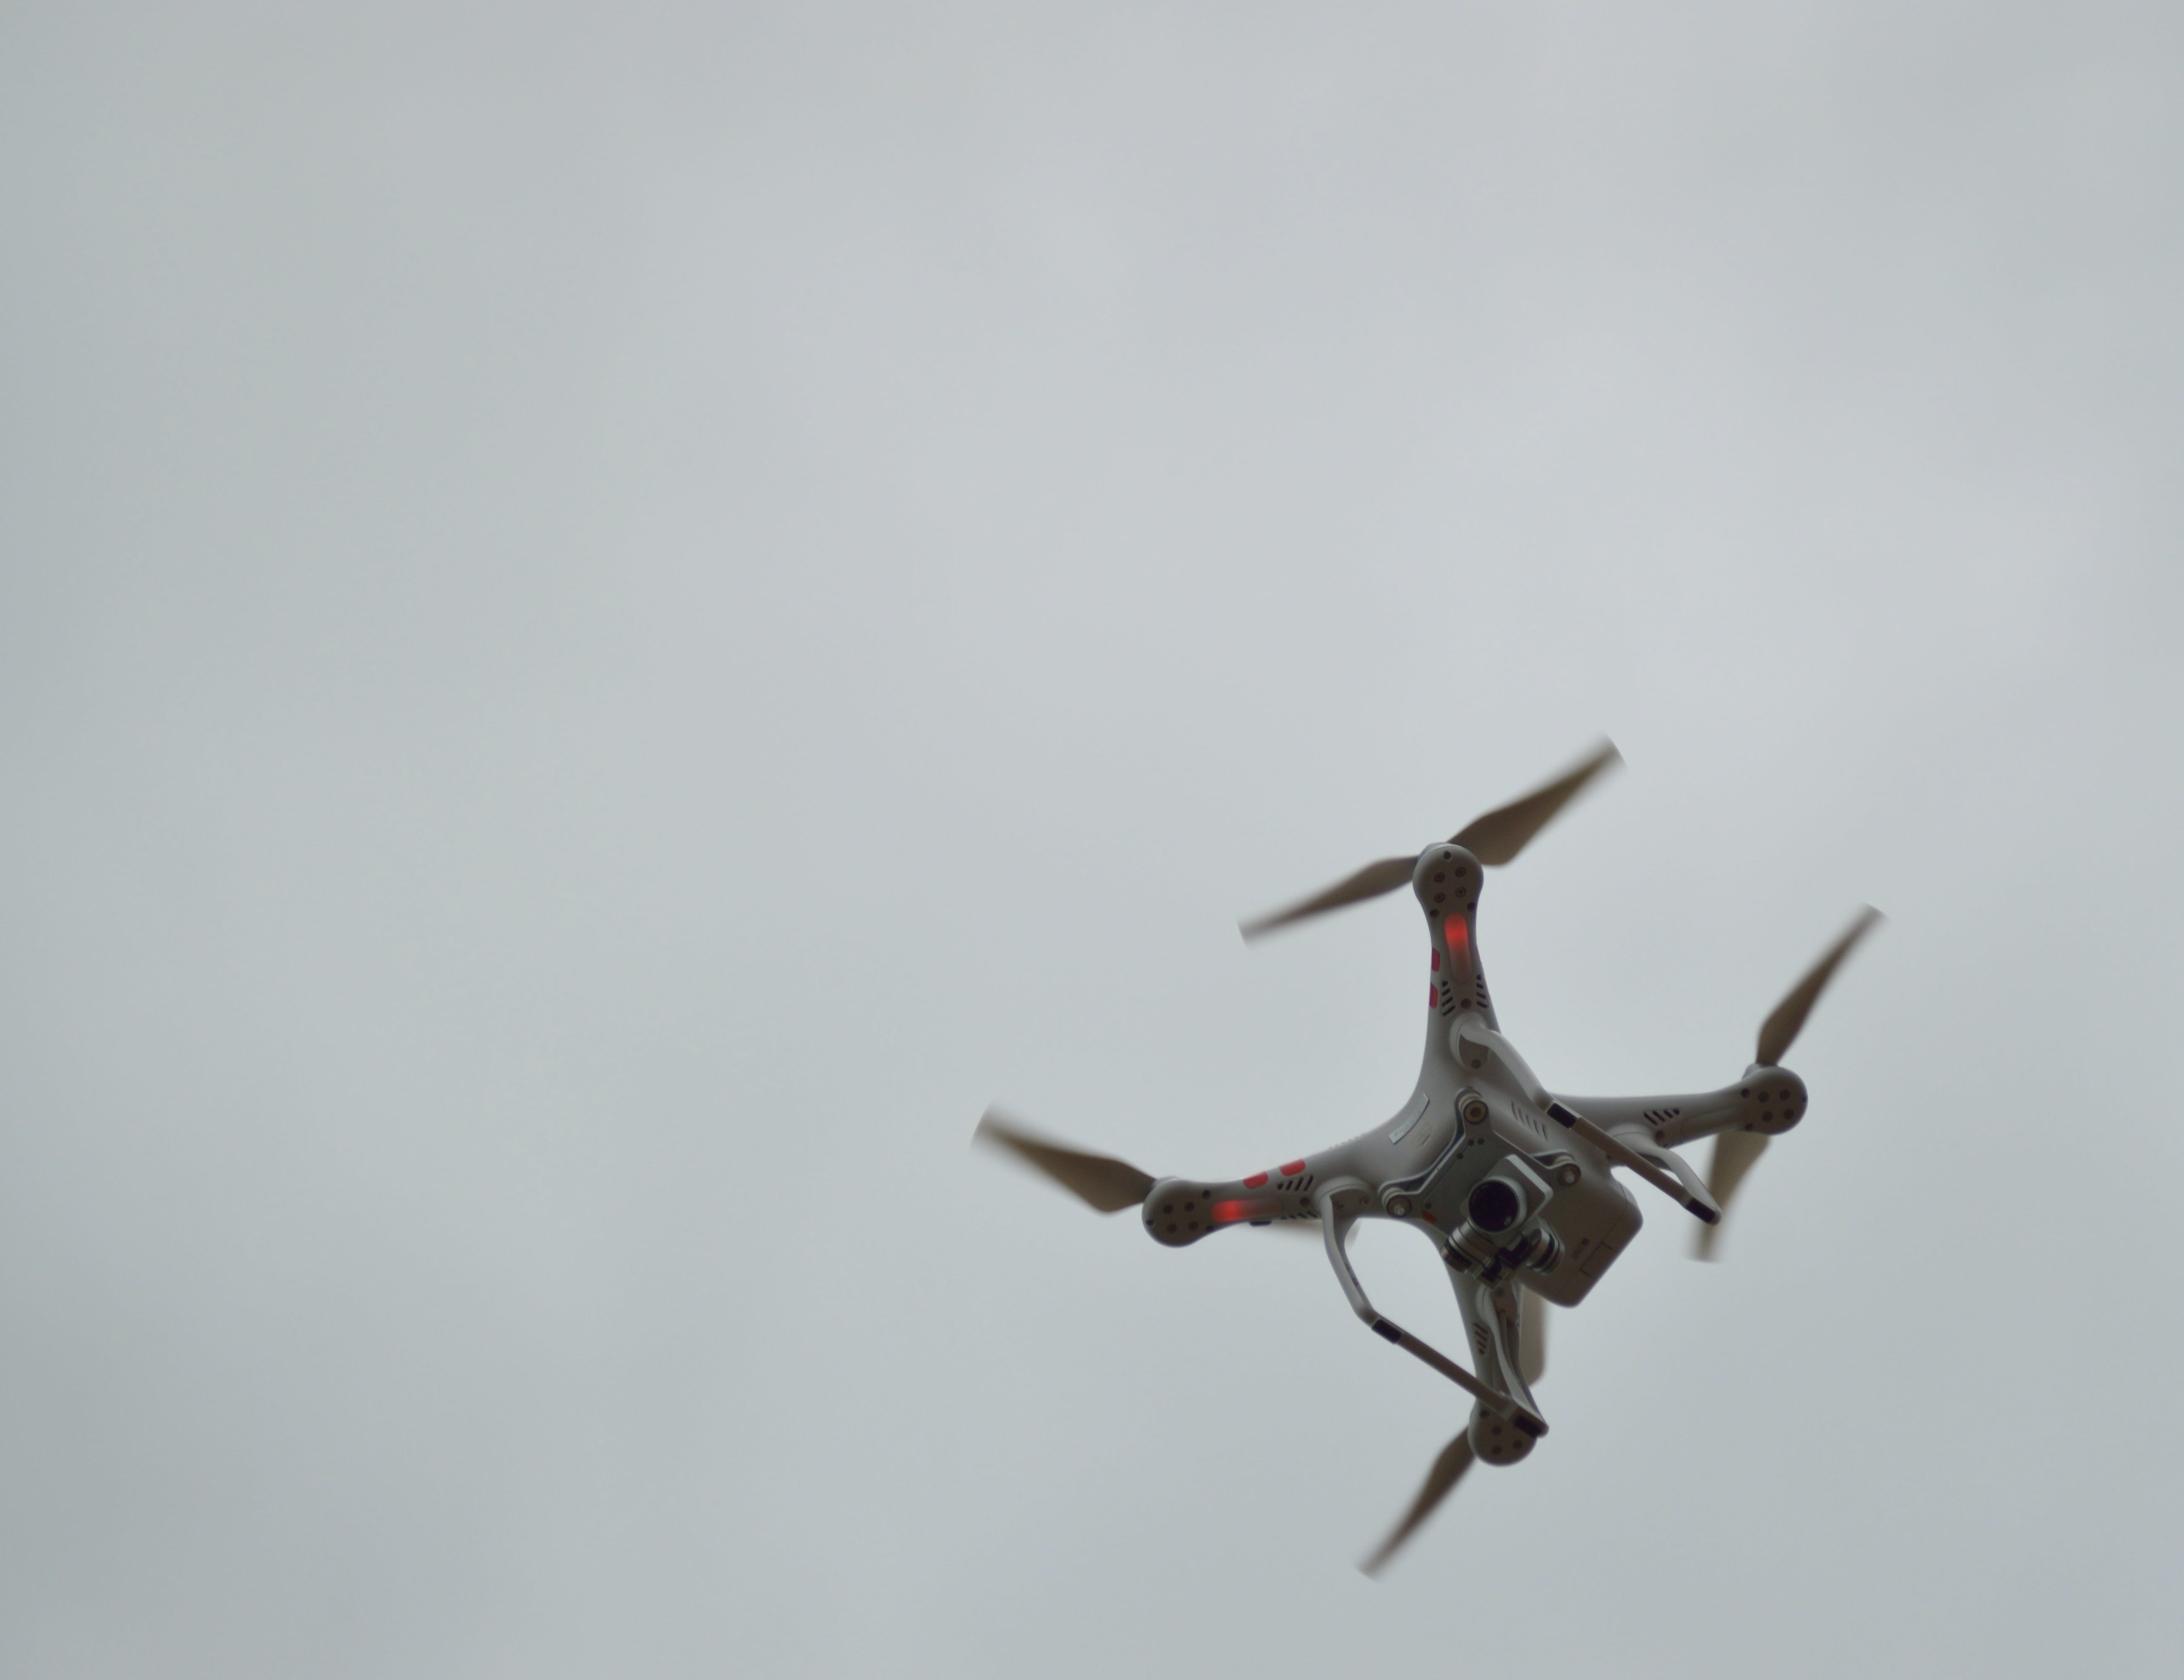 Gray Quadcopter on Flight